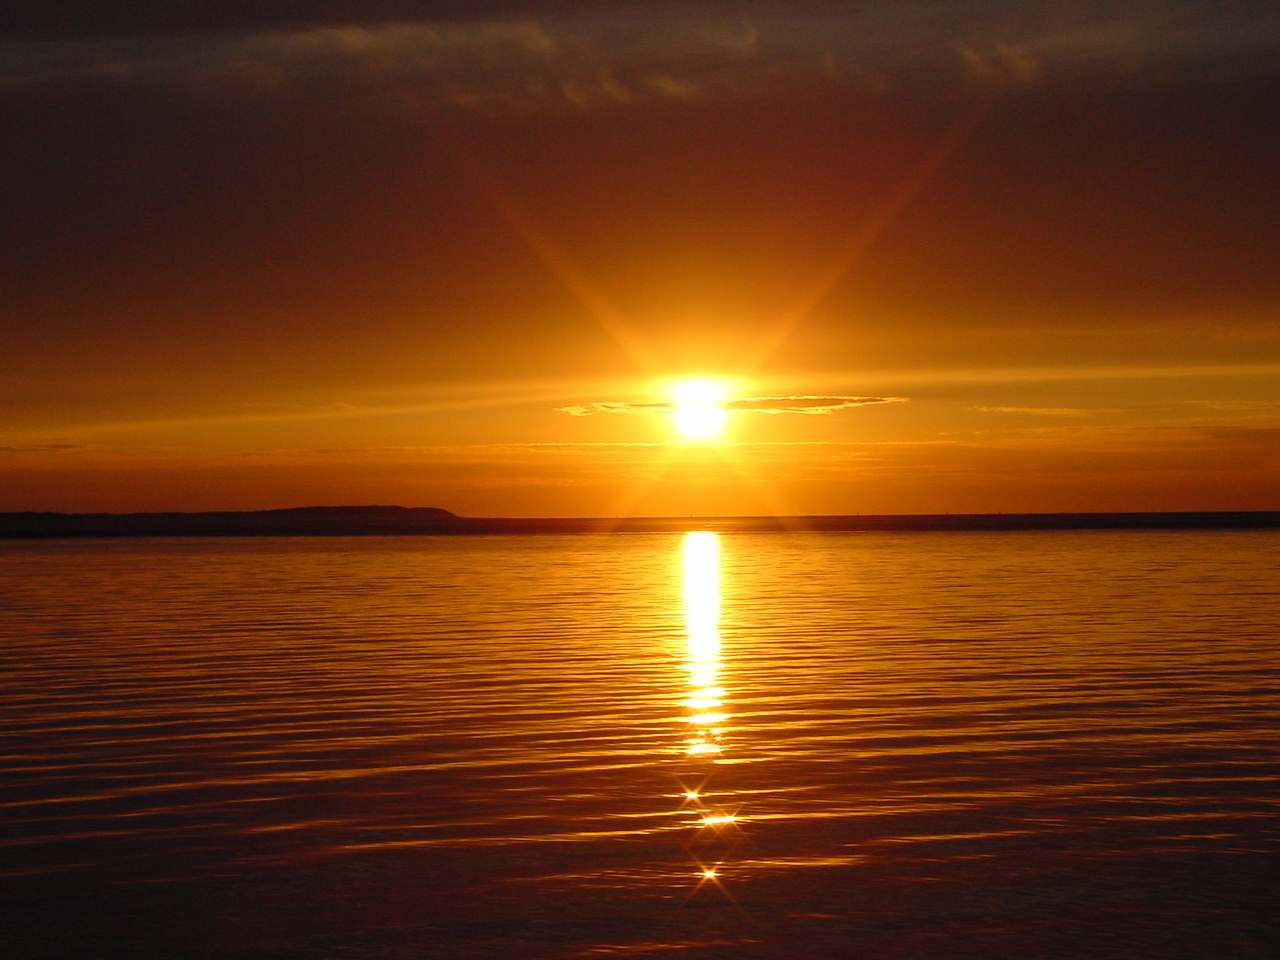 Fondos del sol expectacular mirenlo ustedes taringa for Fondo del sol